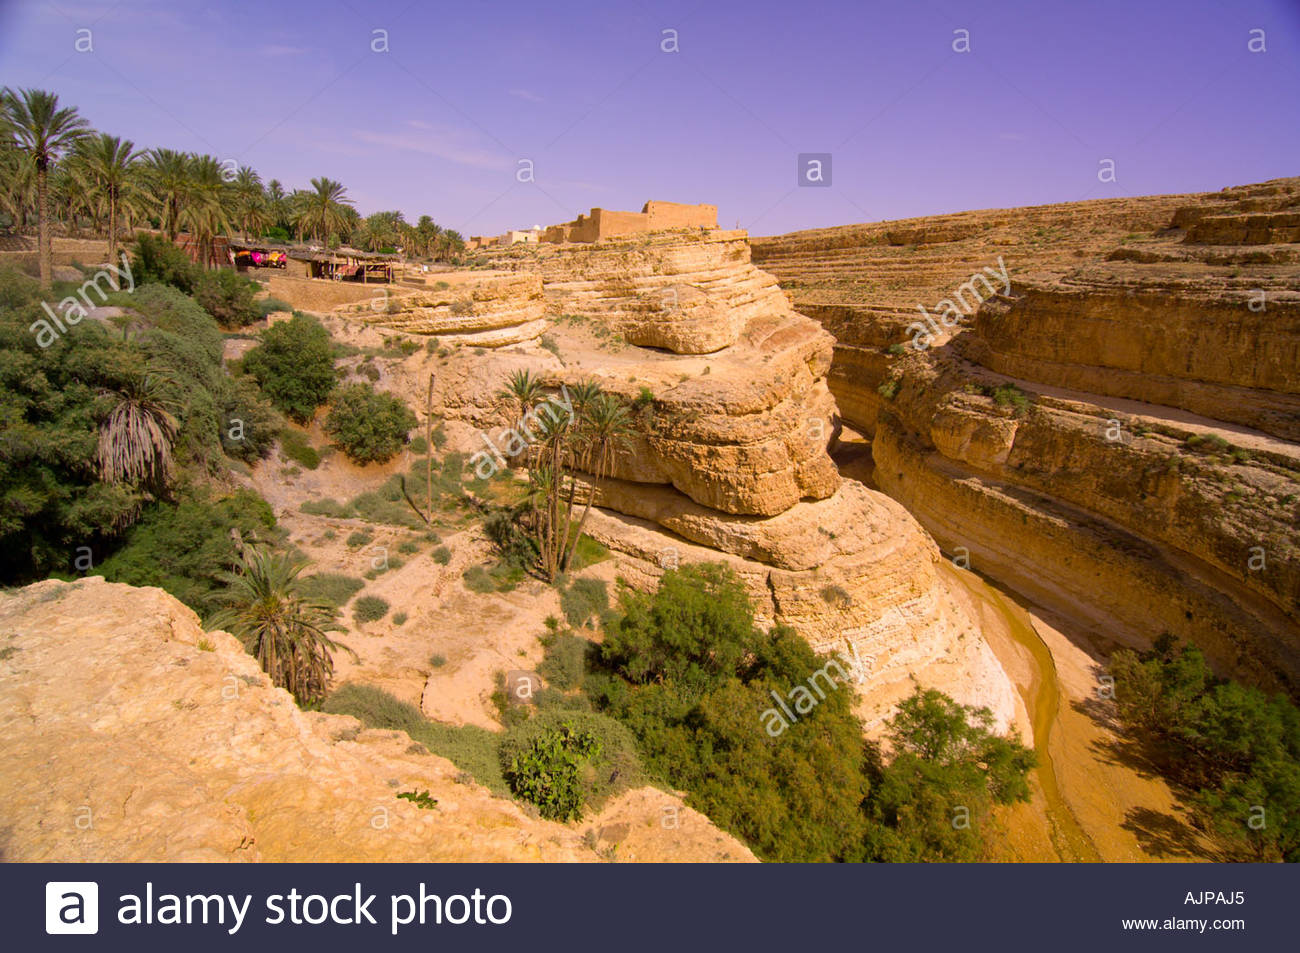 Mides Gorge, el desierto del Sahara, Túnez Foto de stock